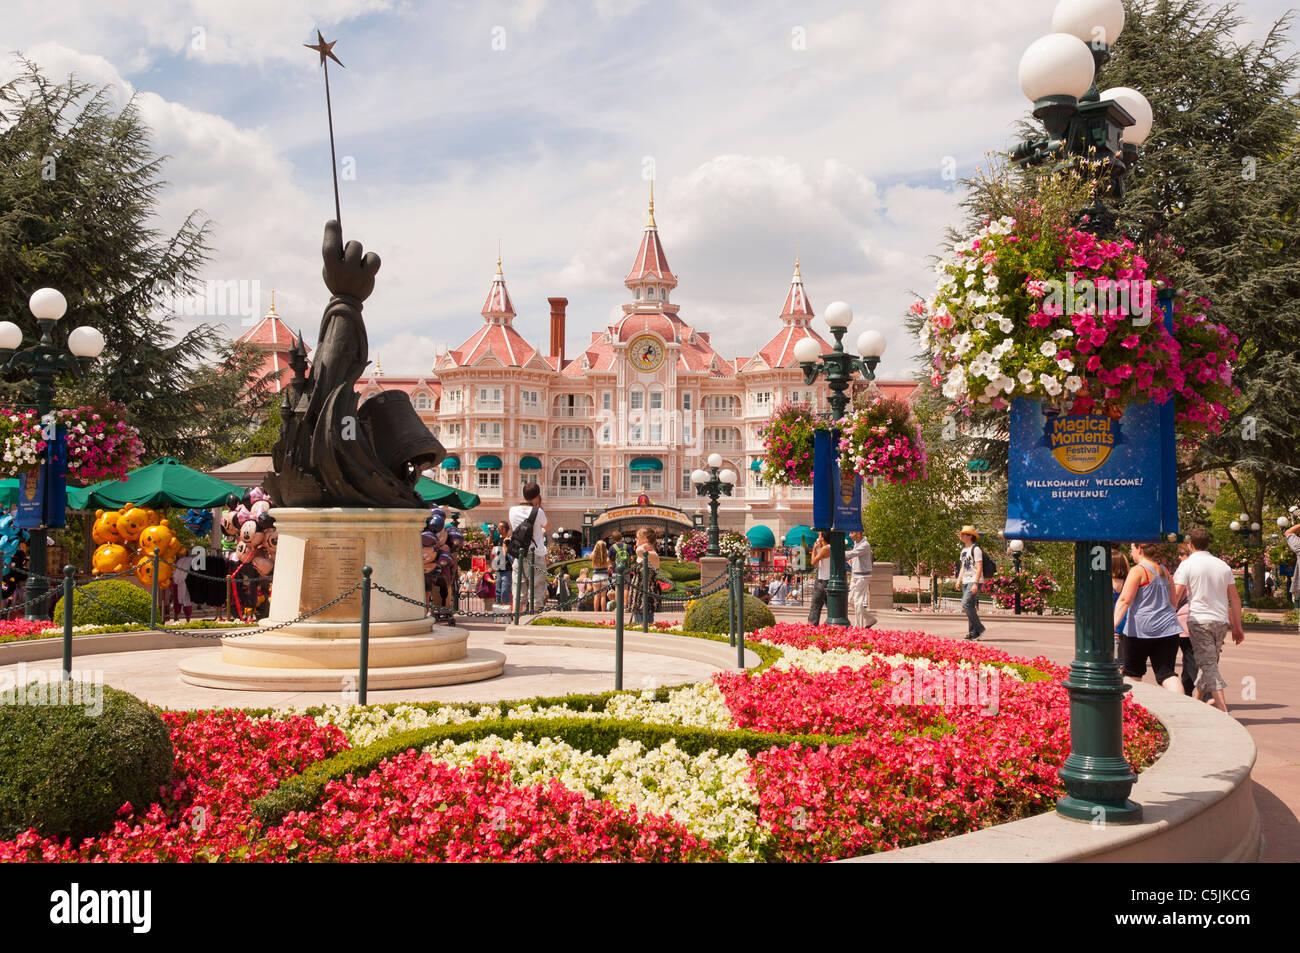 The Disneyland Hotel at Disneyland Paris in France Stock Photo